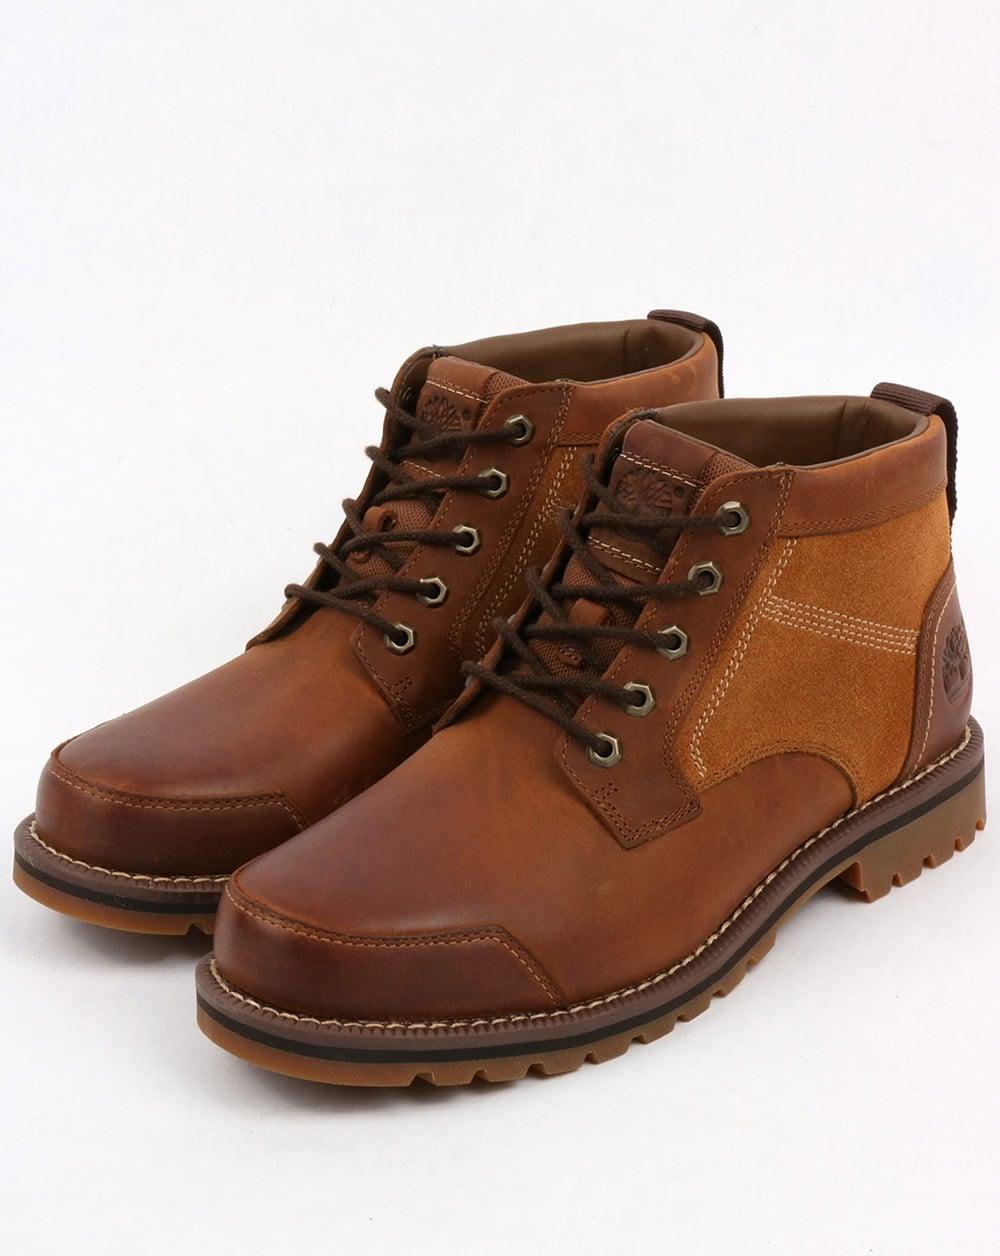 timberland larchmont chukka boots oakwood suede rugged